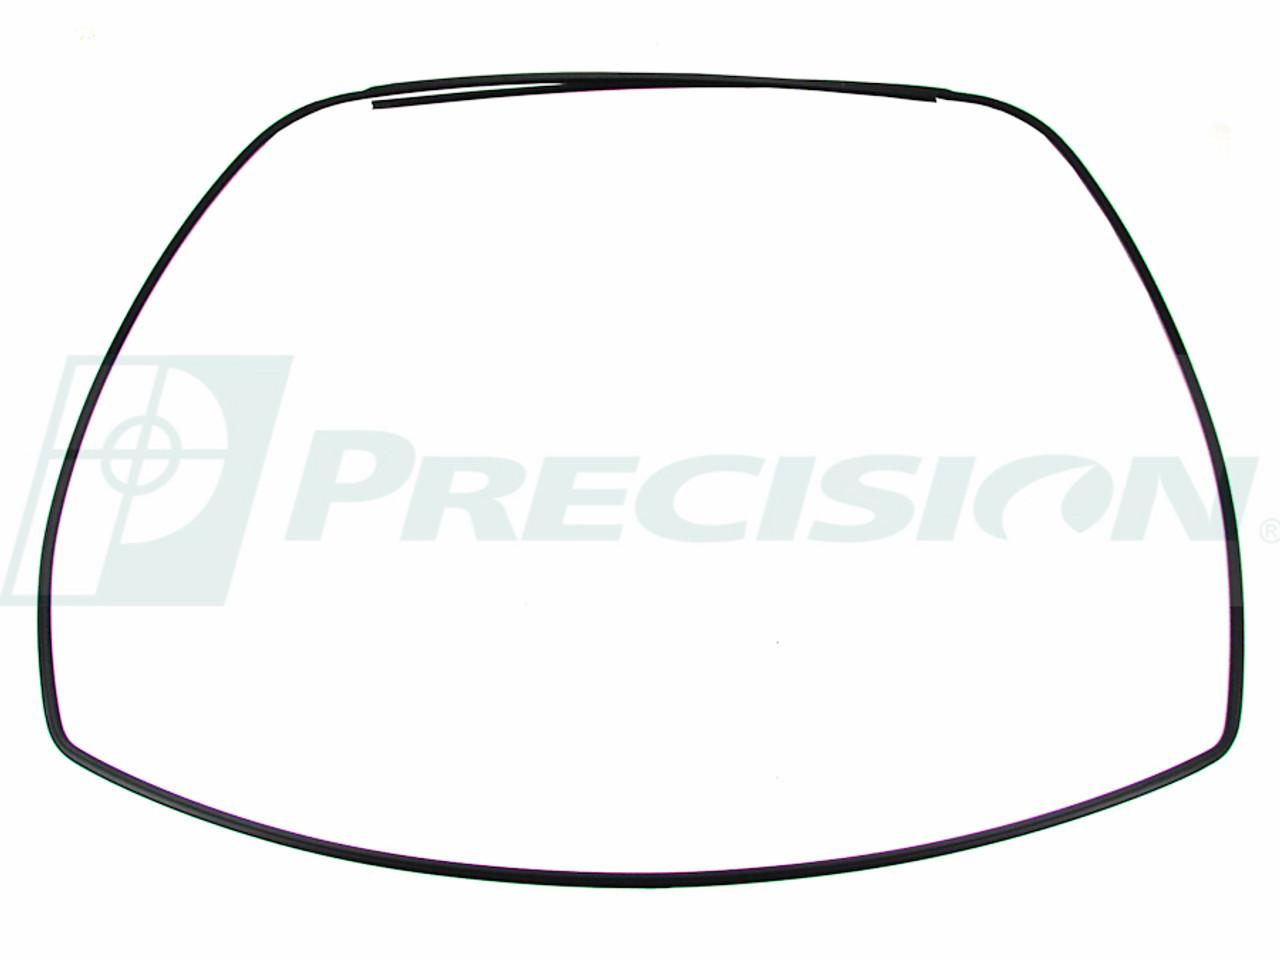 1997 1999 oldsmobile cutlass 4 dr sedan windshield molding quality car interior quality car interior